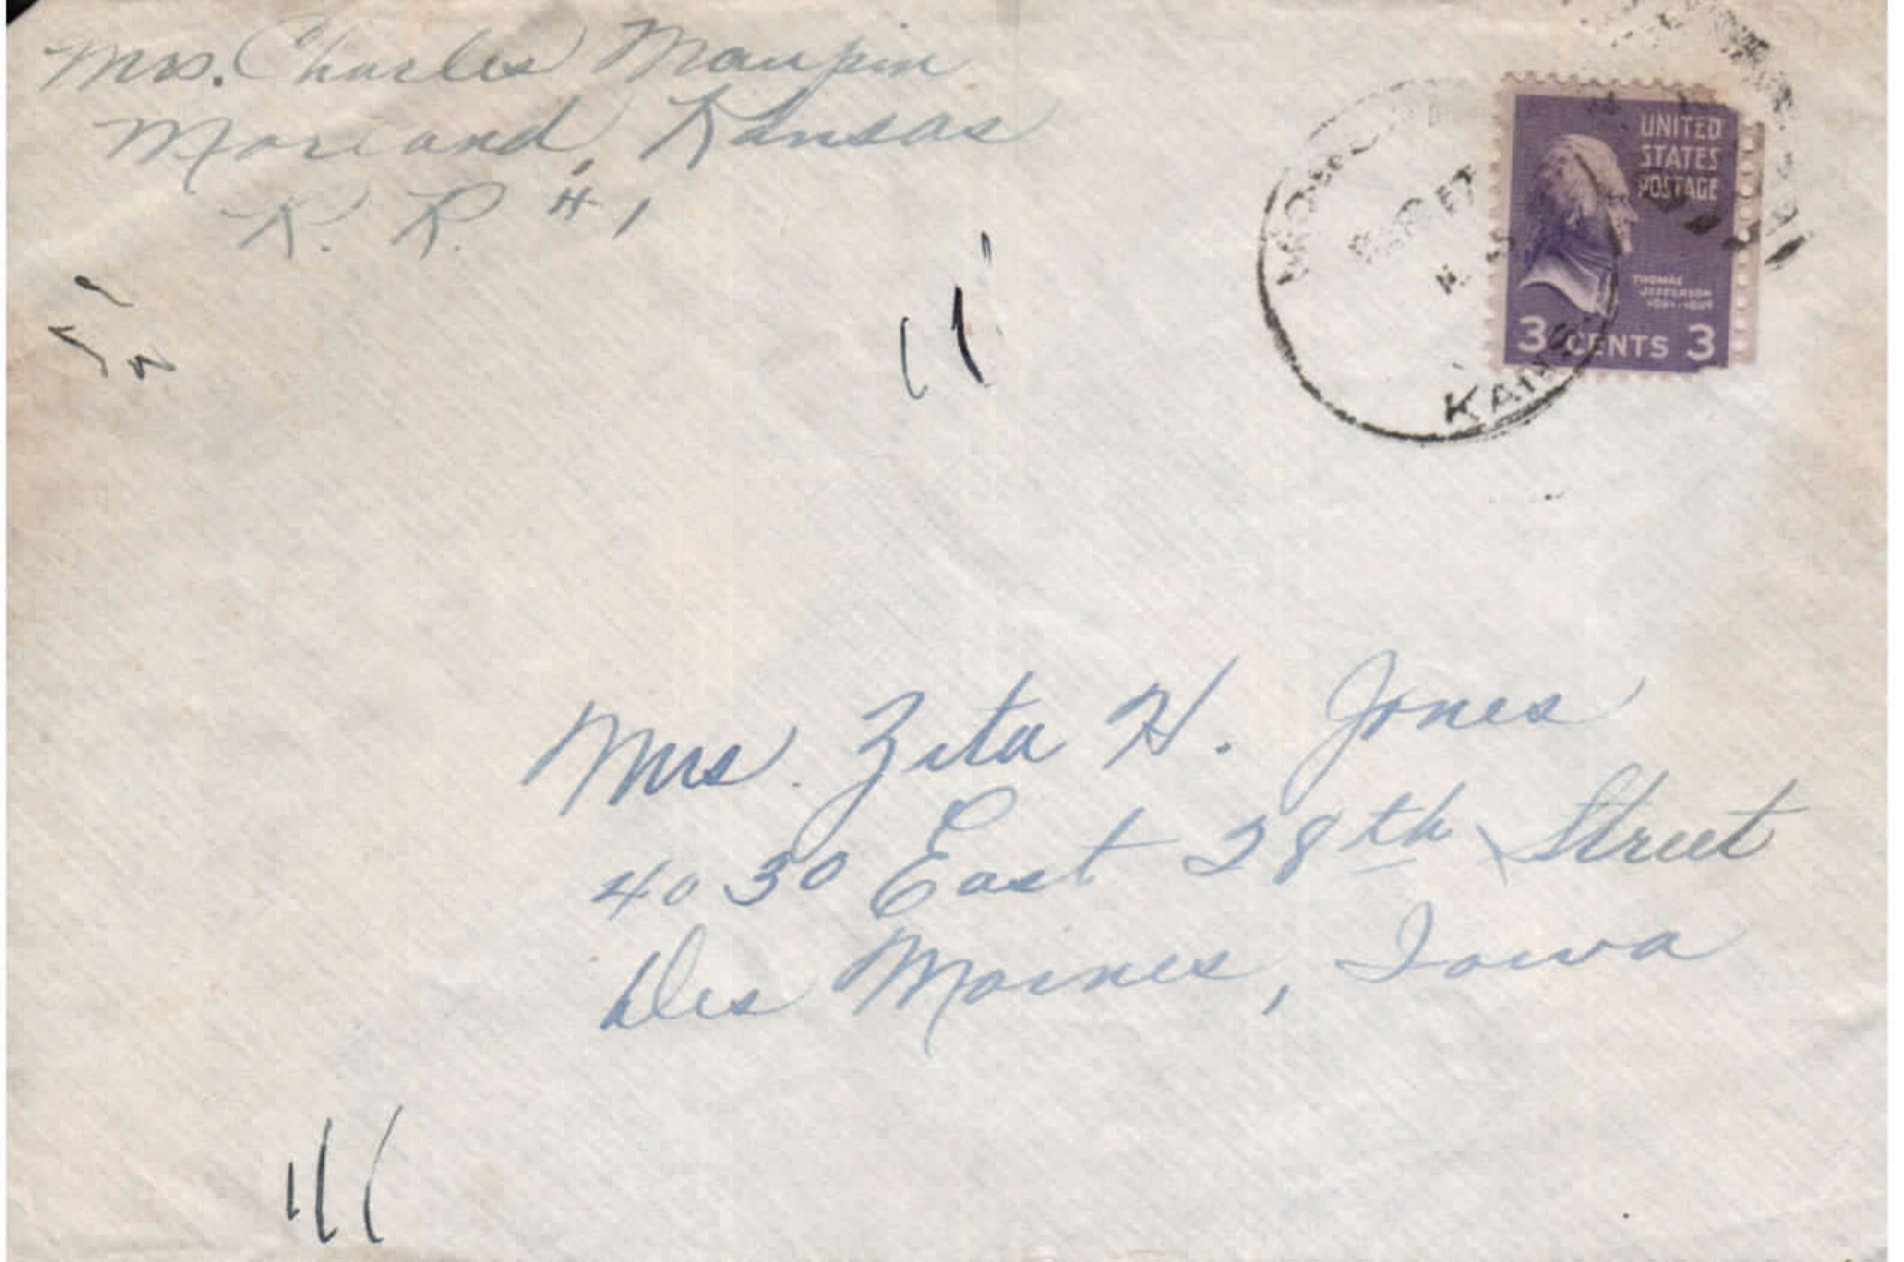 Maupin 3-15-1945 1.jpg